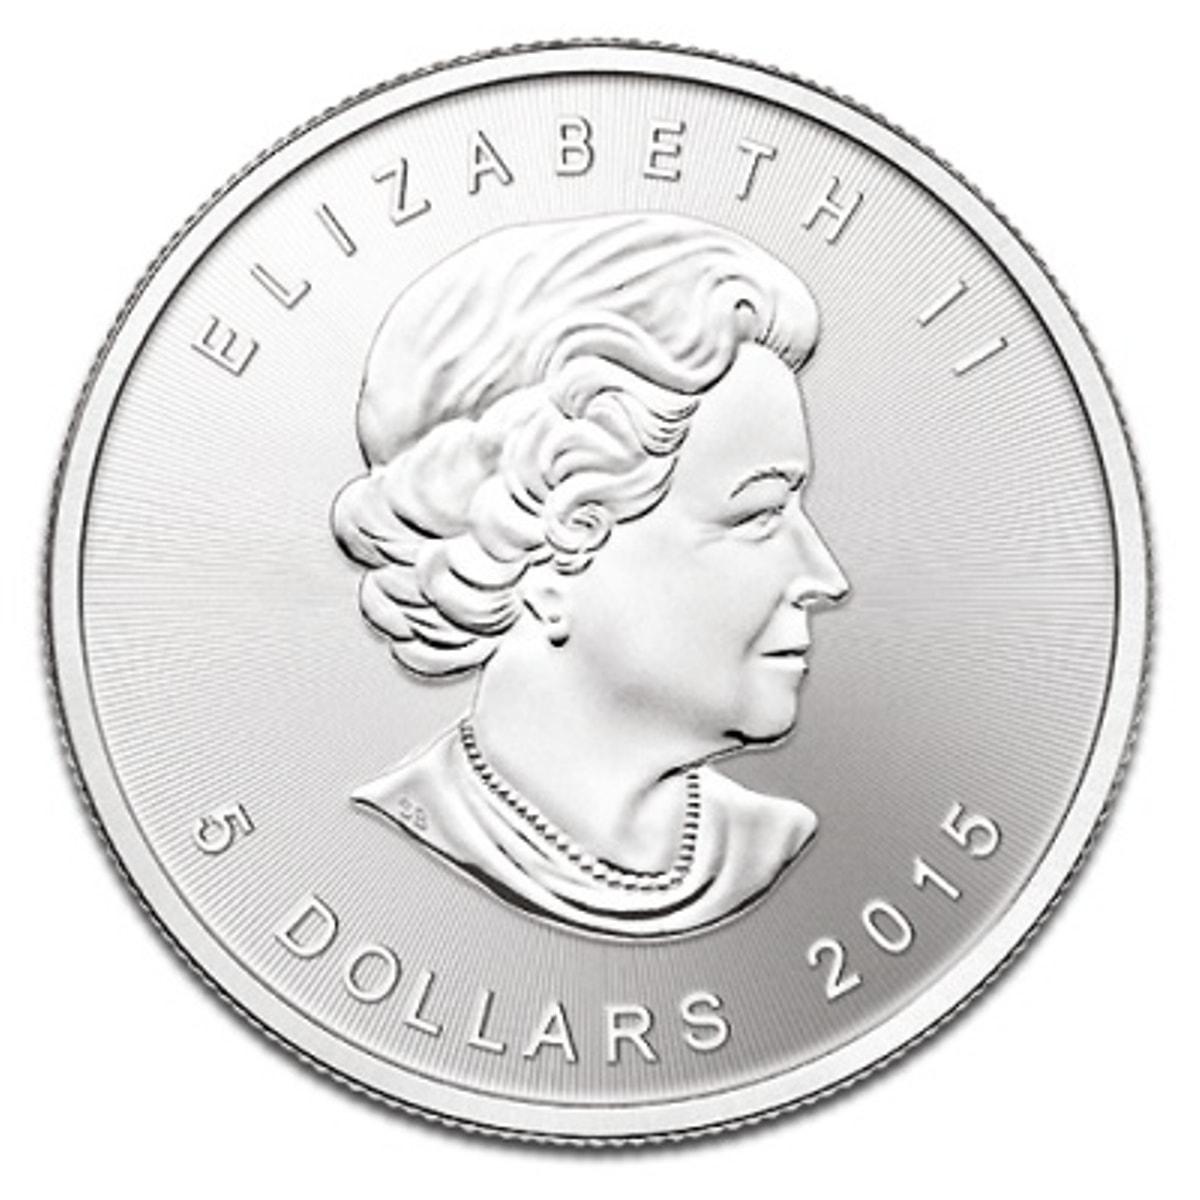 2015 - 2015 Fine 999.9 Silver Proof 1oz Canadian Maple $5 Dollars Bullion Coin #21